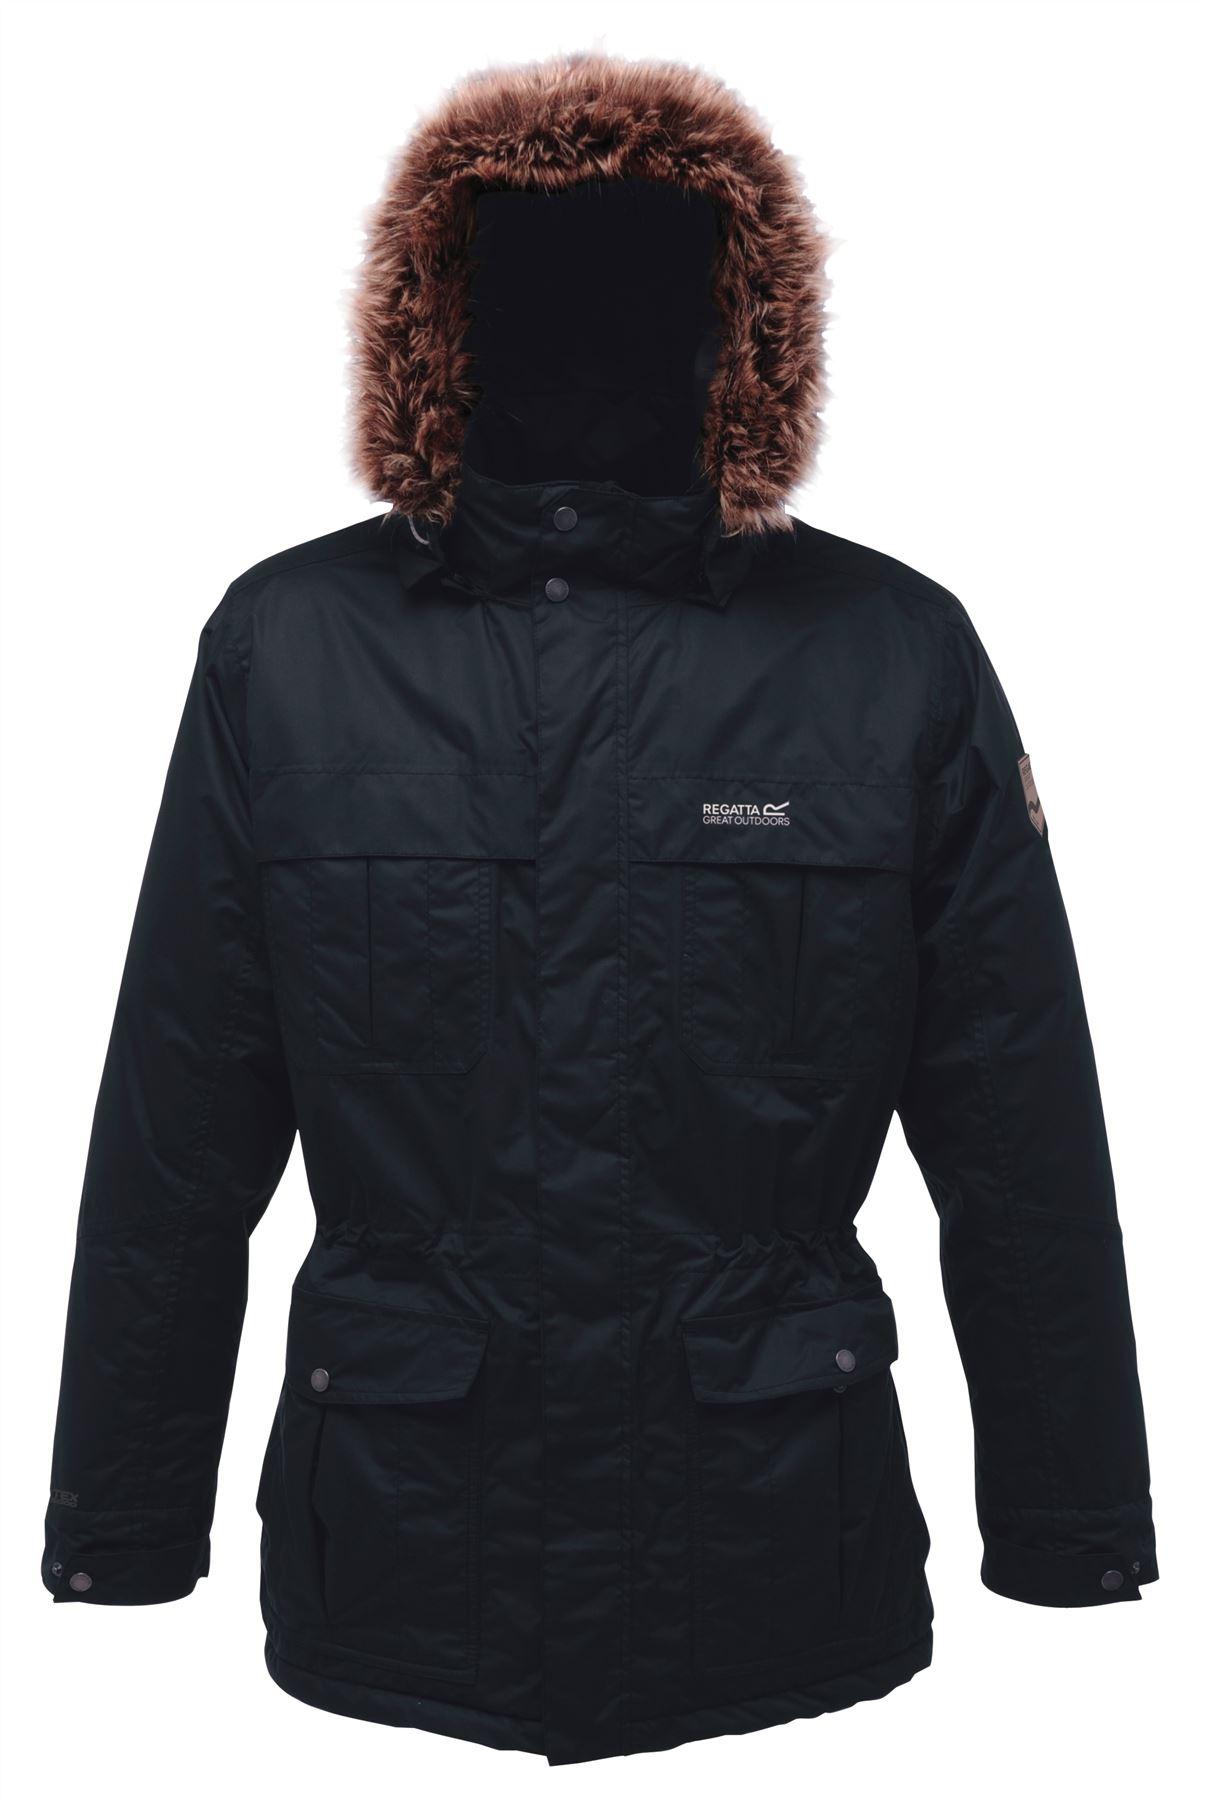 Regatta Mens SALTON Waterproof Breathable Thermo Insulated Parka Jacket Coat